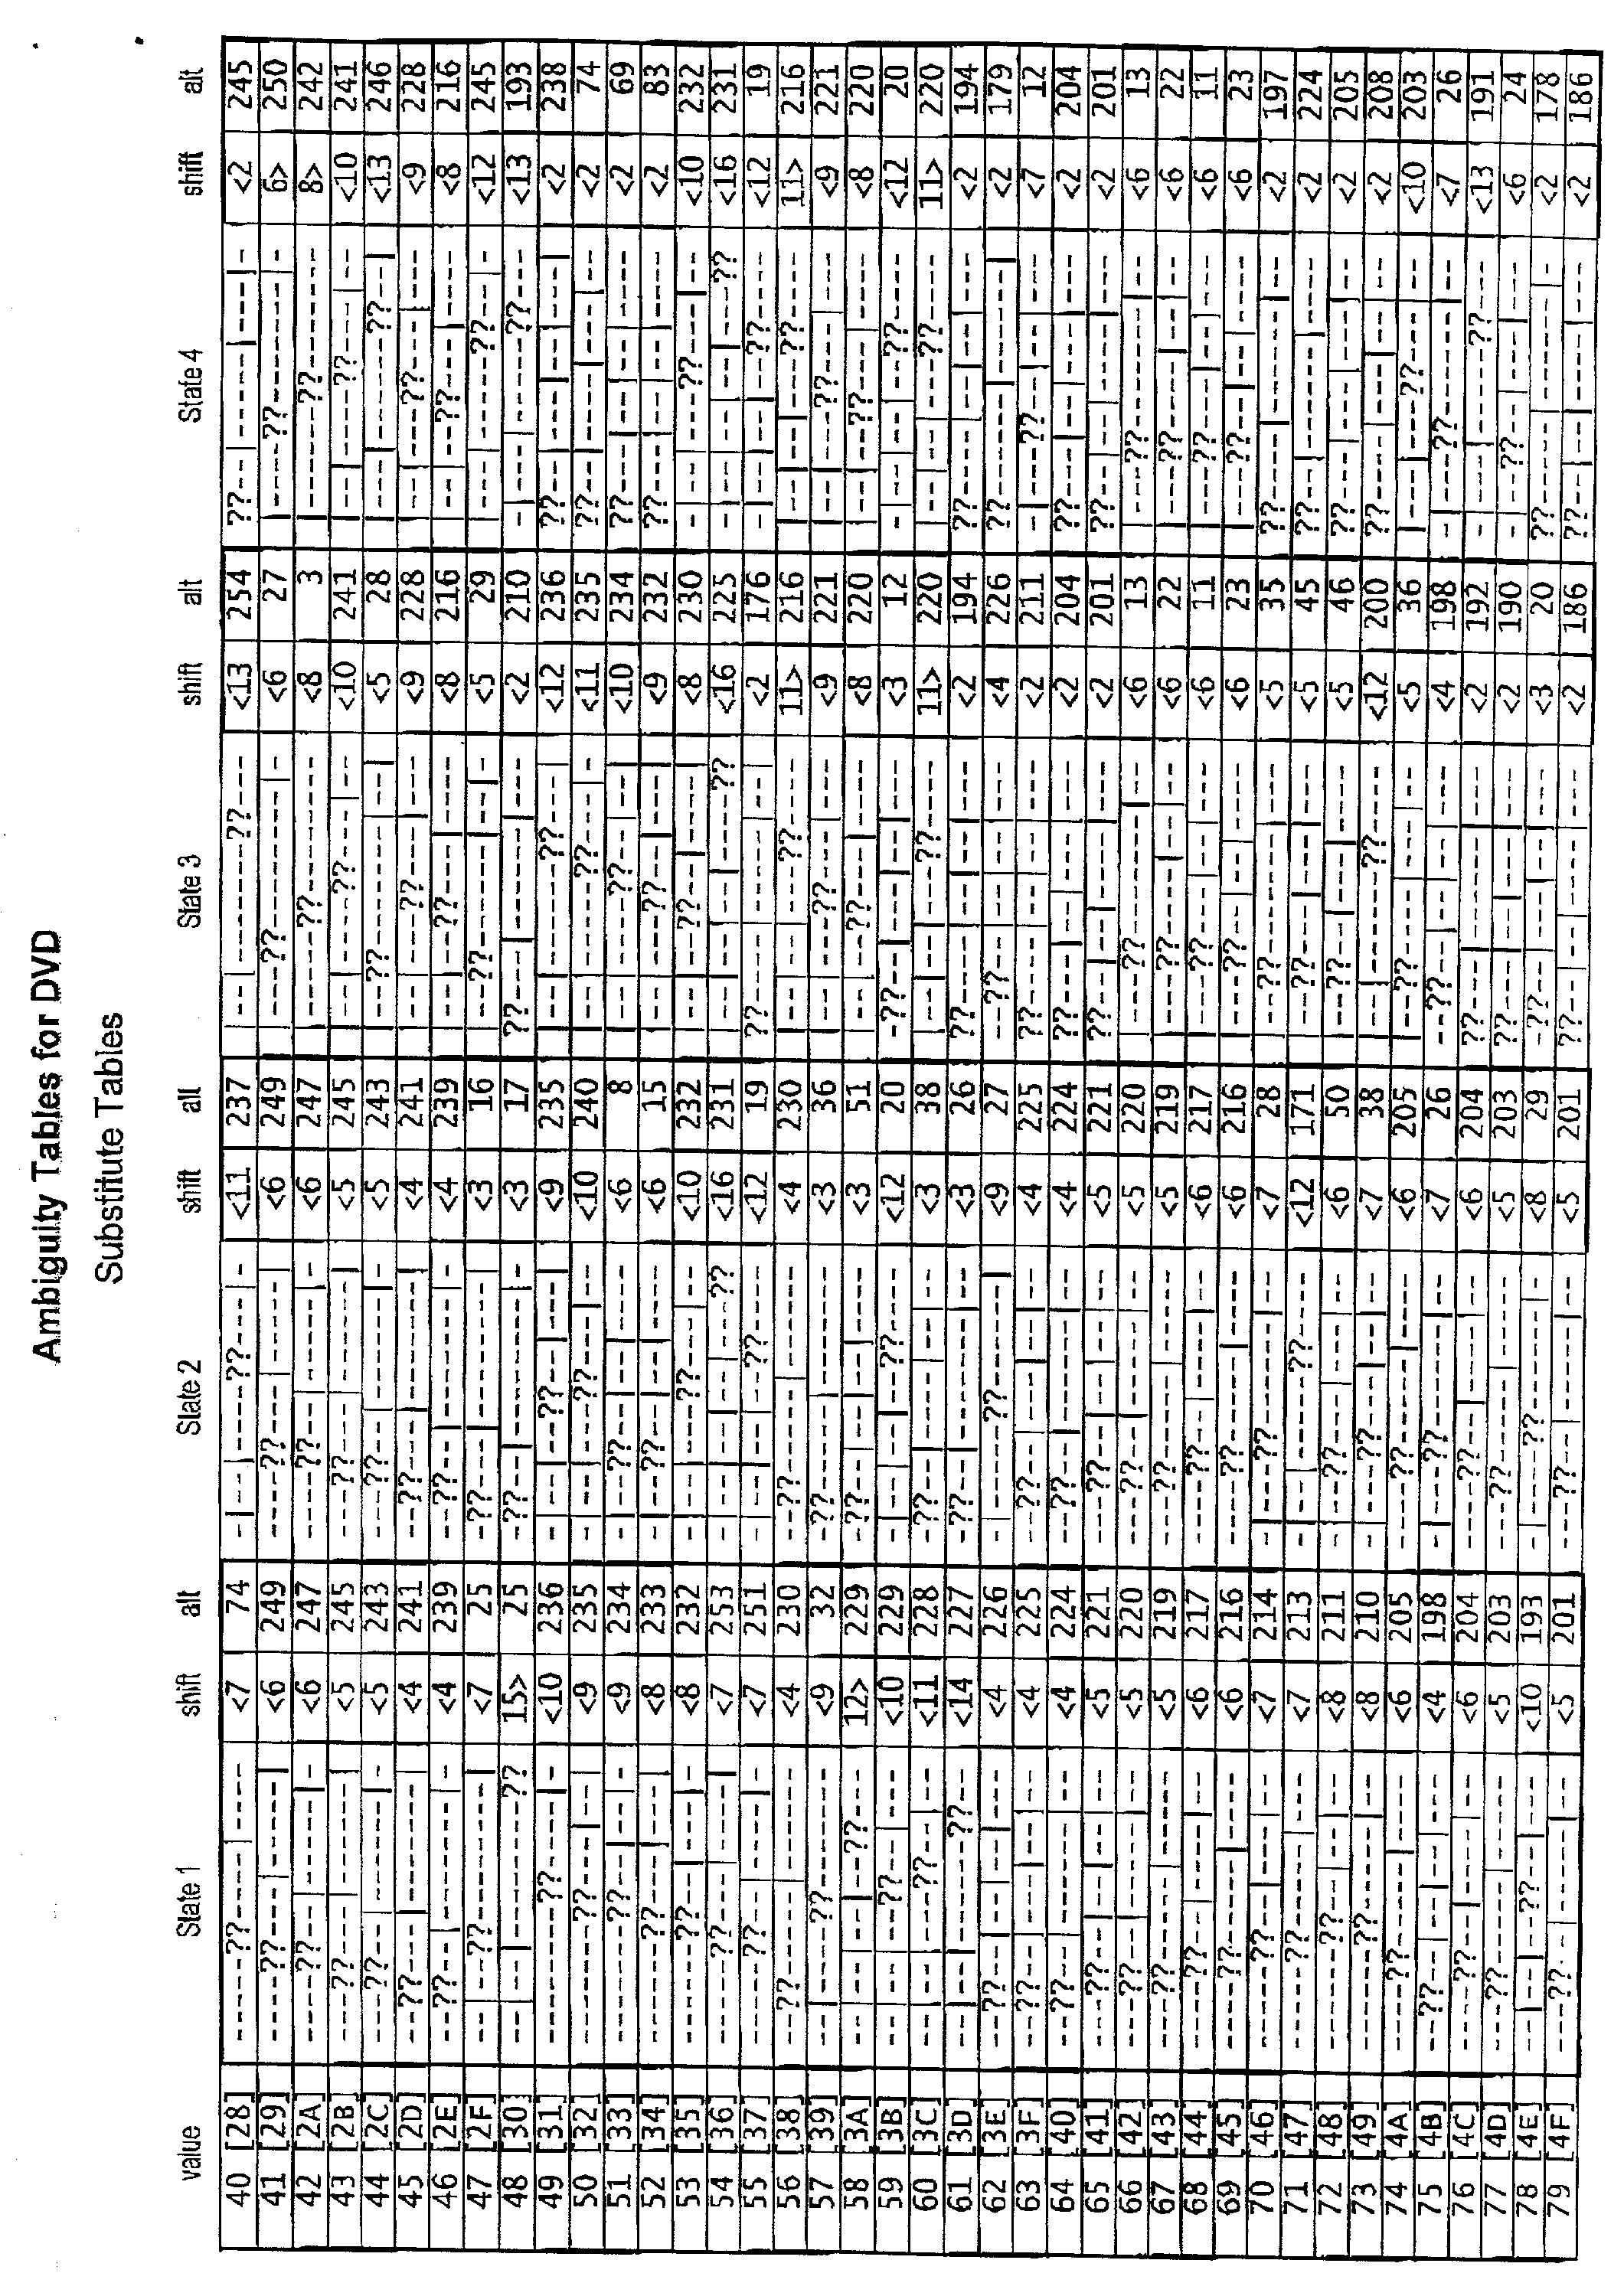 Figure US20020069389A1-20020606-P00010